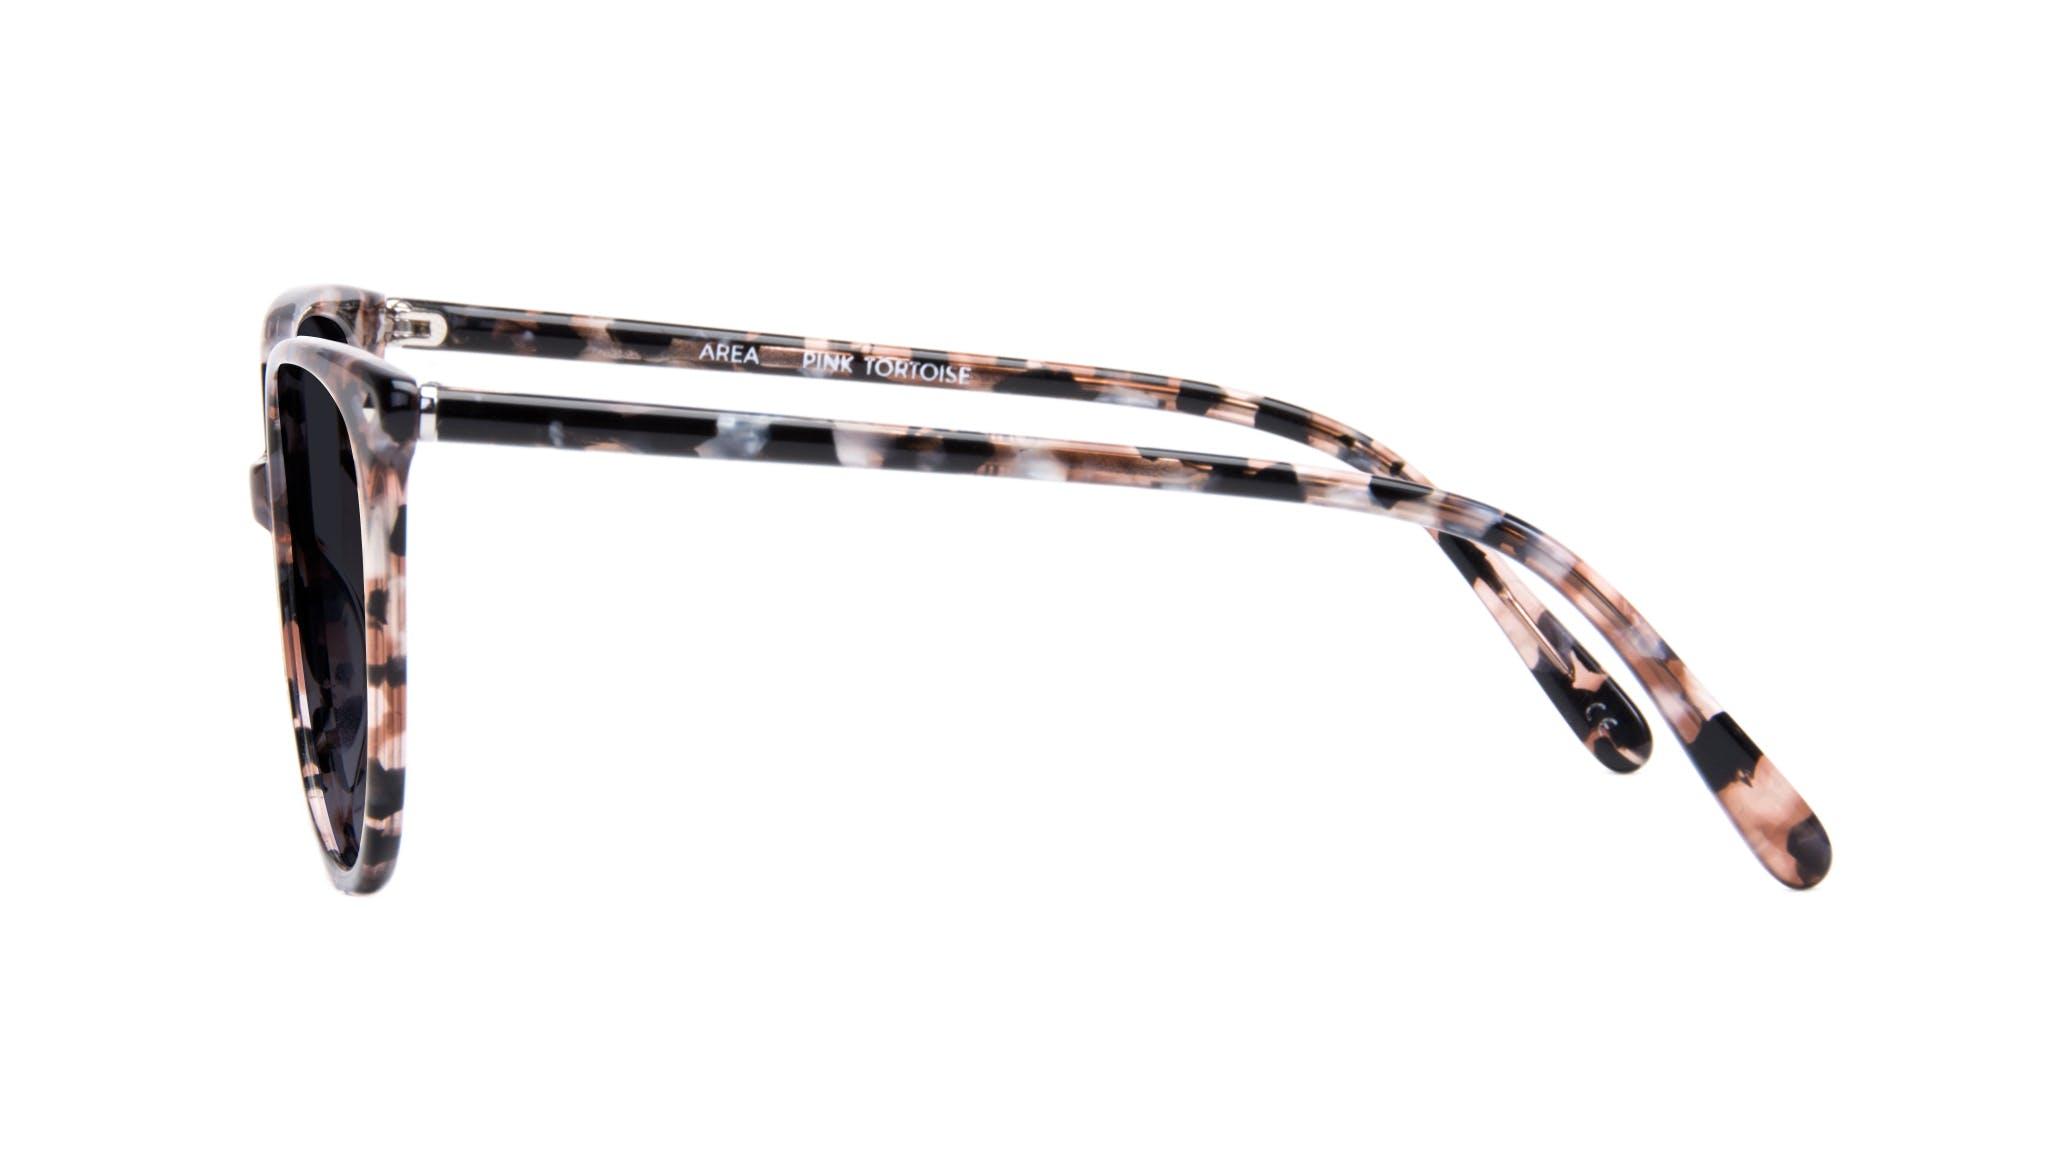 Affordable Fashion Glasses Cat Eye Square Sunglasses Women Area Pink Tortoise Side